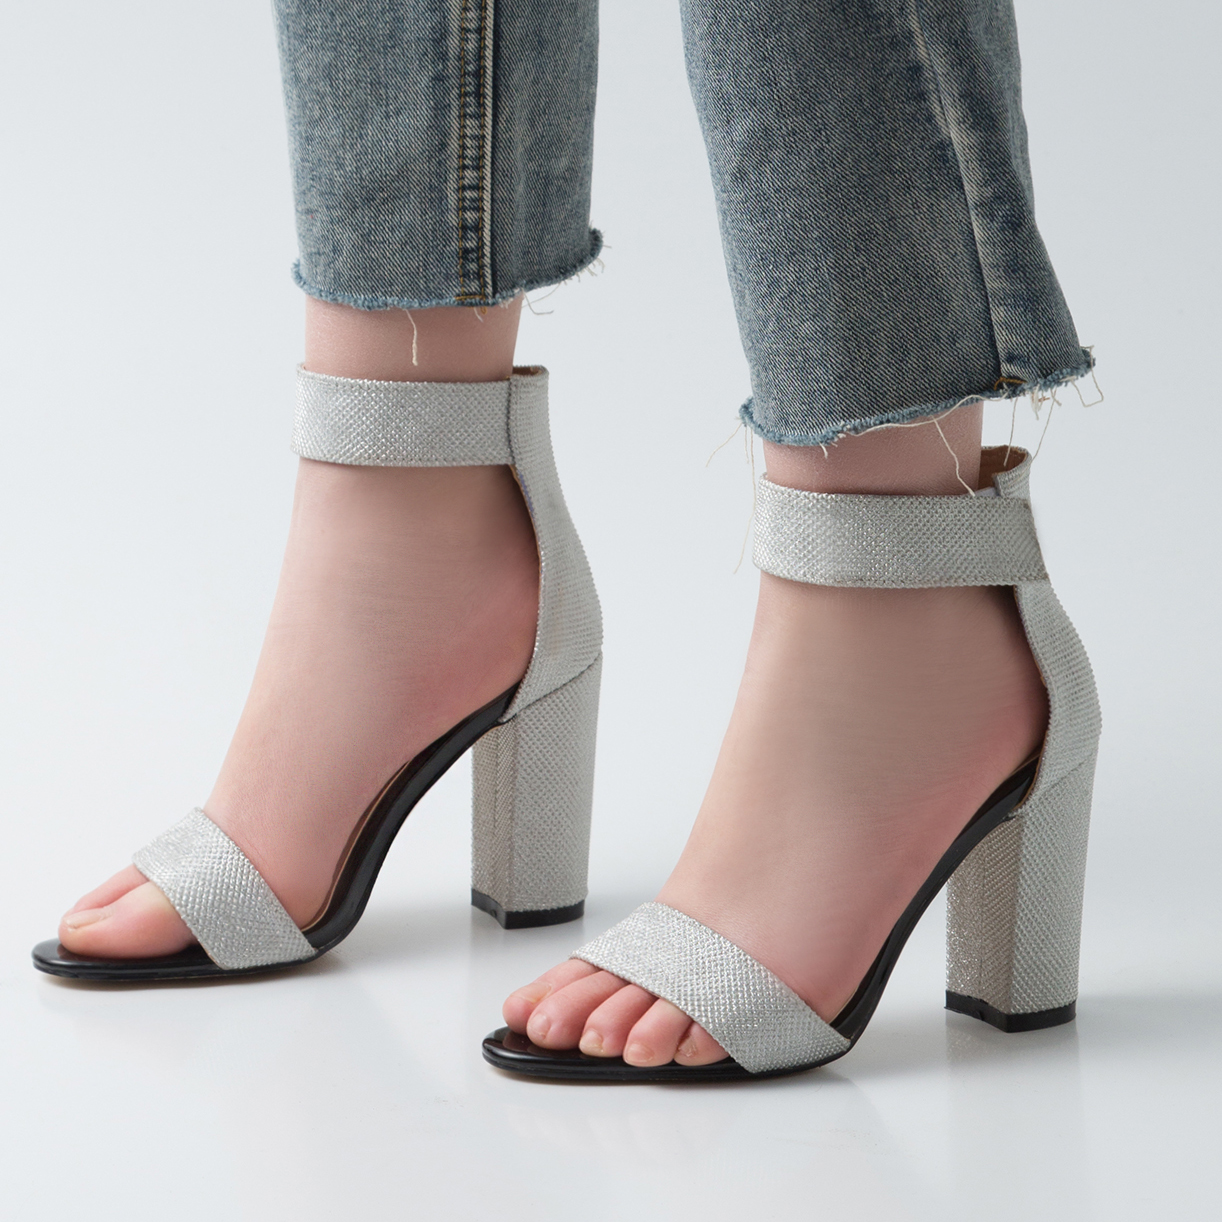 Arden Furtado summer 2019 fashion trend